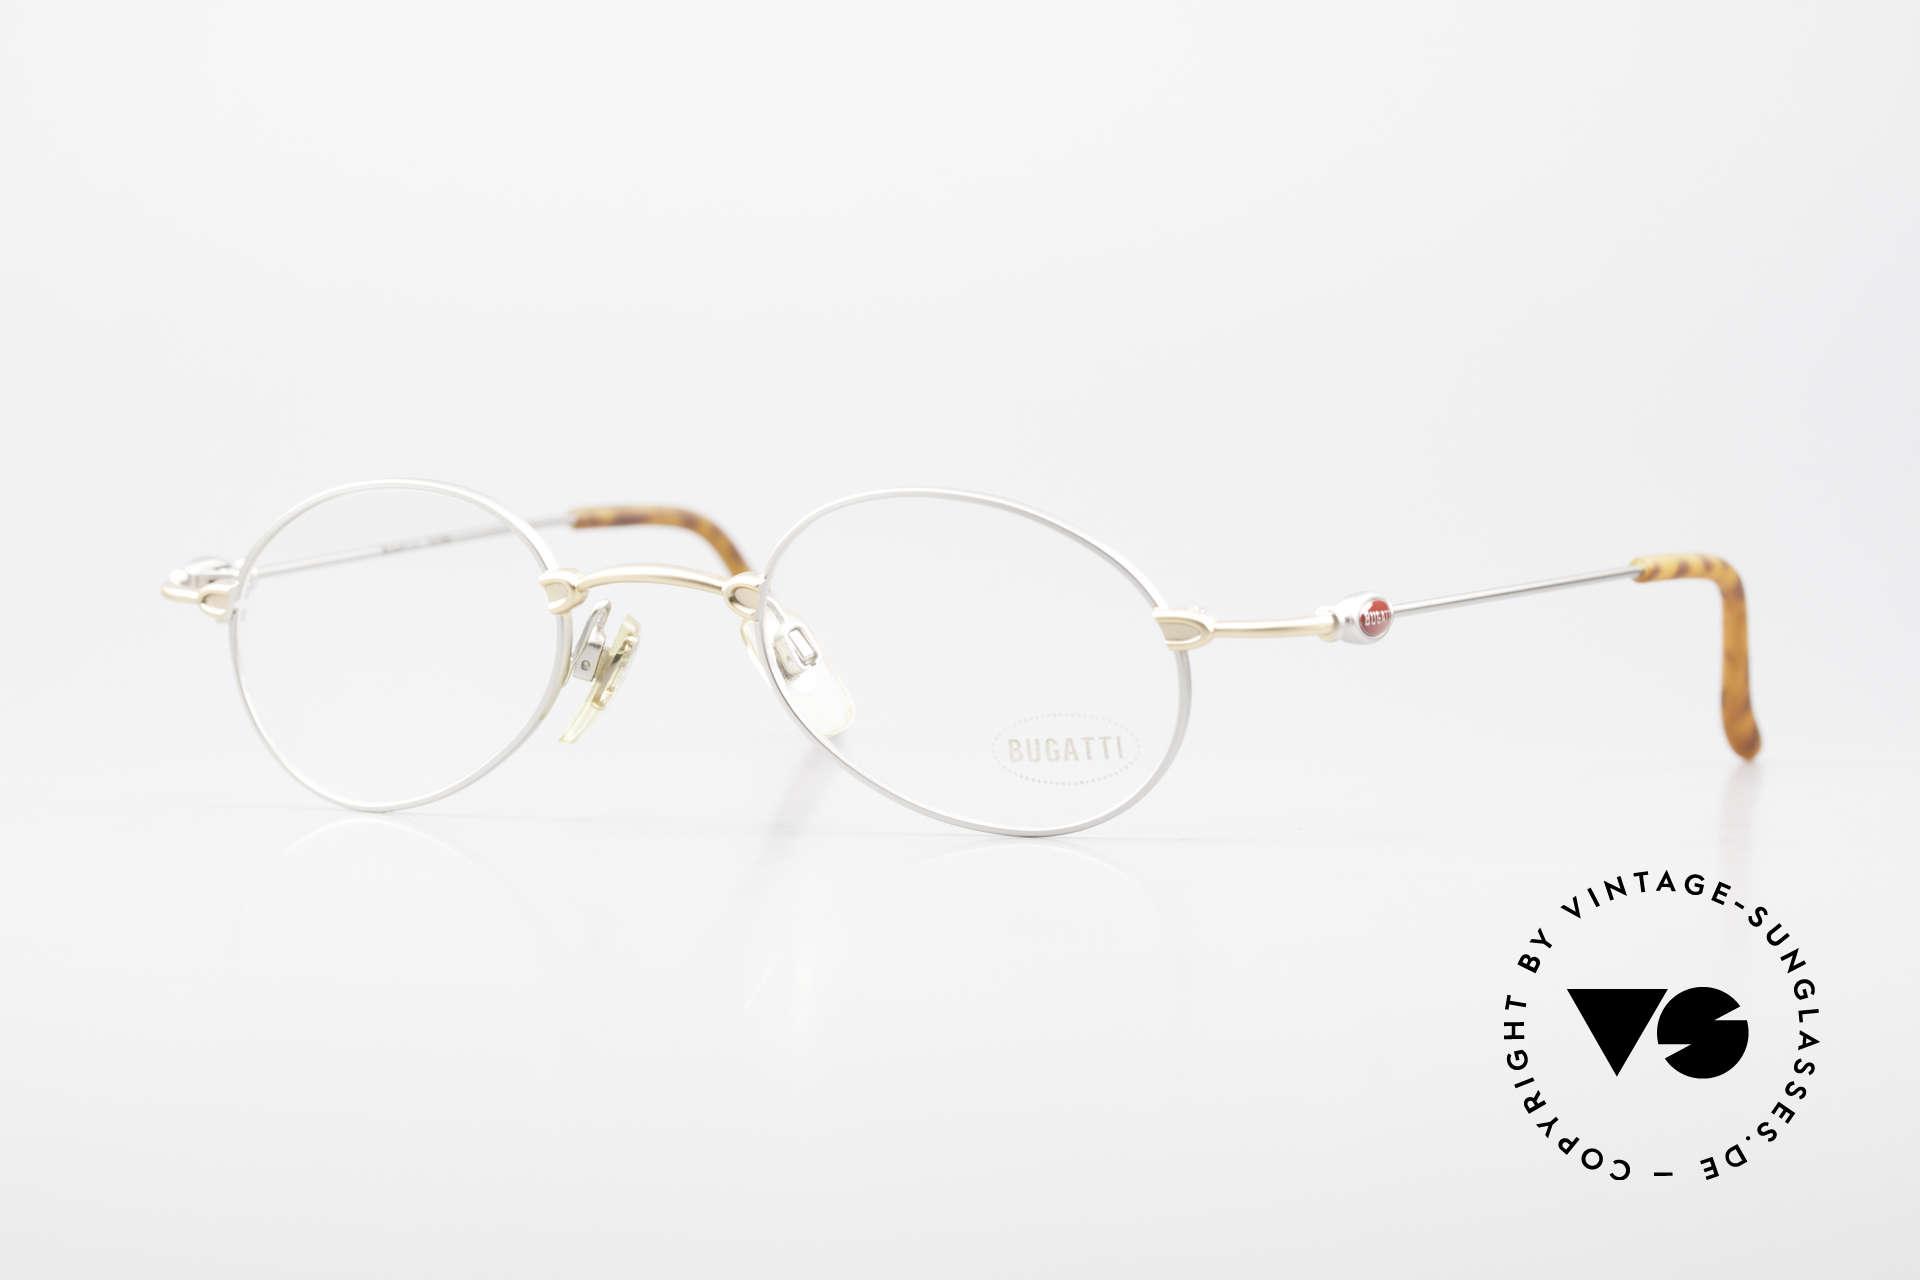 Bugatti 10759 Vintage Eyeglasses Men 90's, leightweight men's designer eyeglasses by BUGATTI, Made for Men